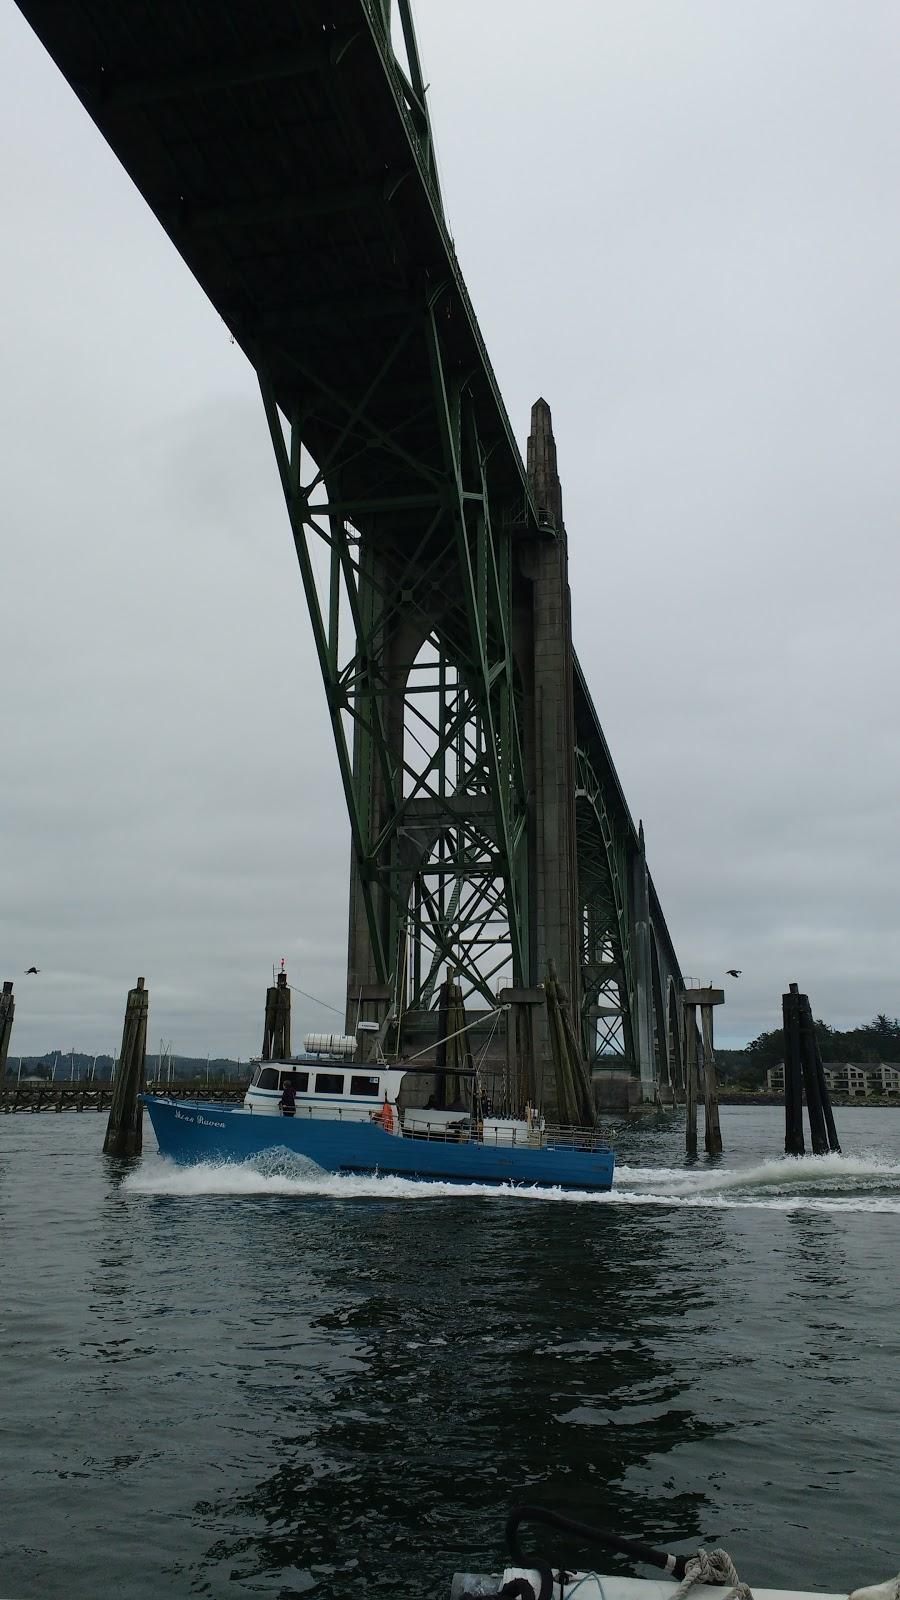 Sailing adventures of david kathy coos bay to newport for Coos bay fishing charters